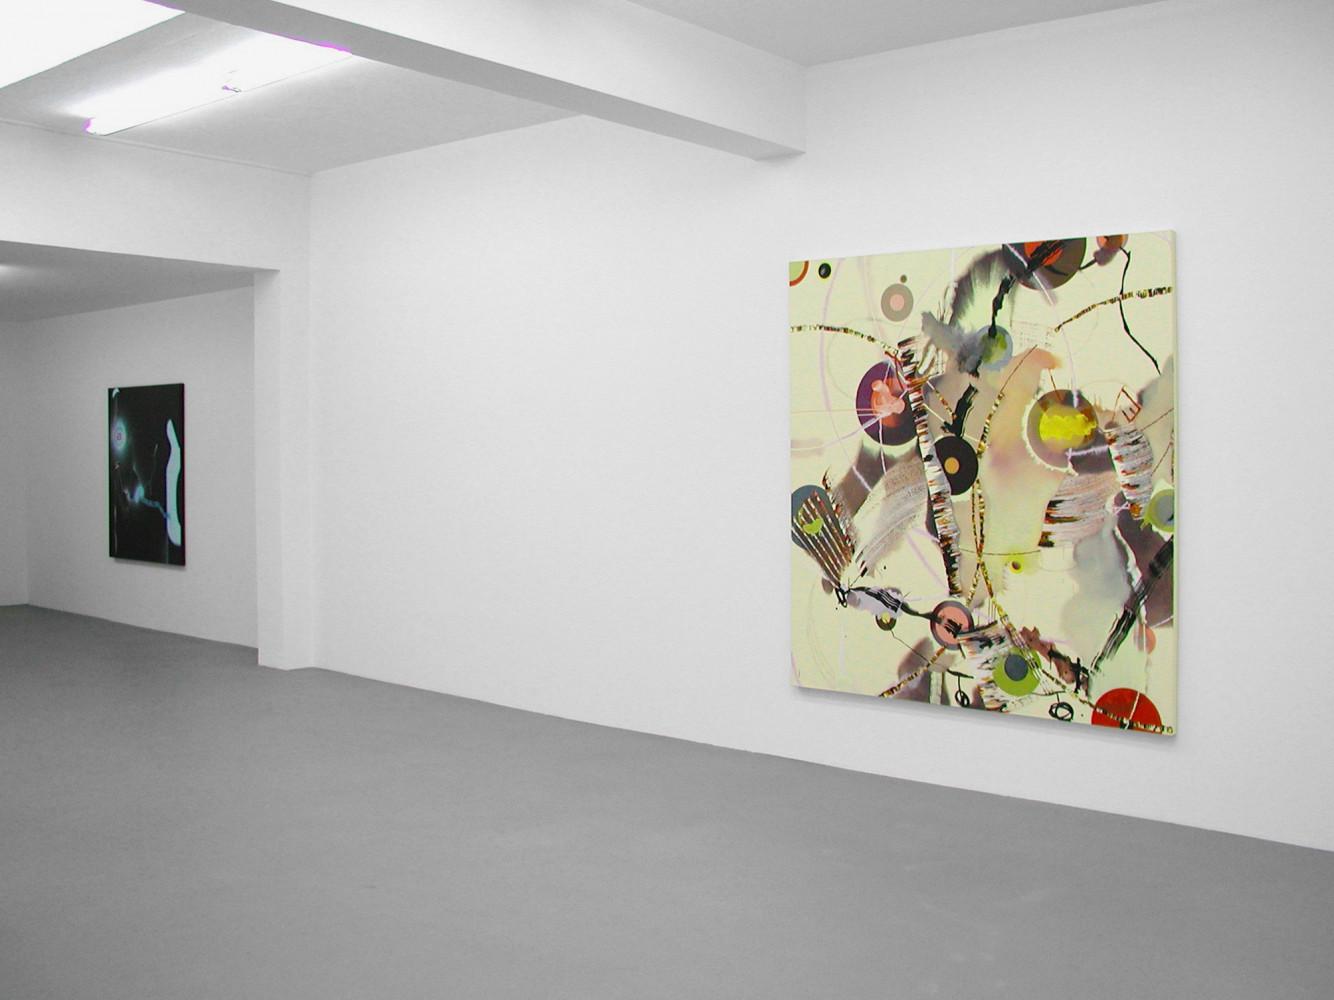 'Malerei – Arturo Herrera, Dennis Hollingsworth, Fiona Rae, Juan Uslé', Installation view, 2003